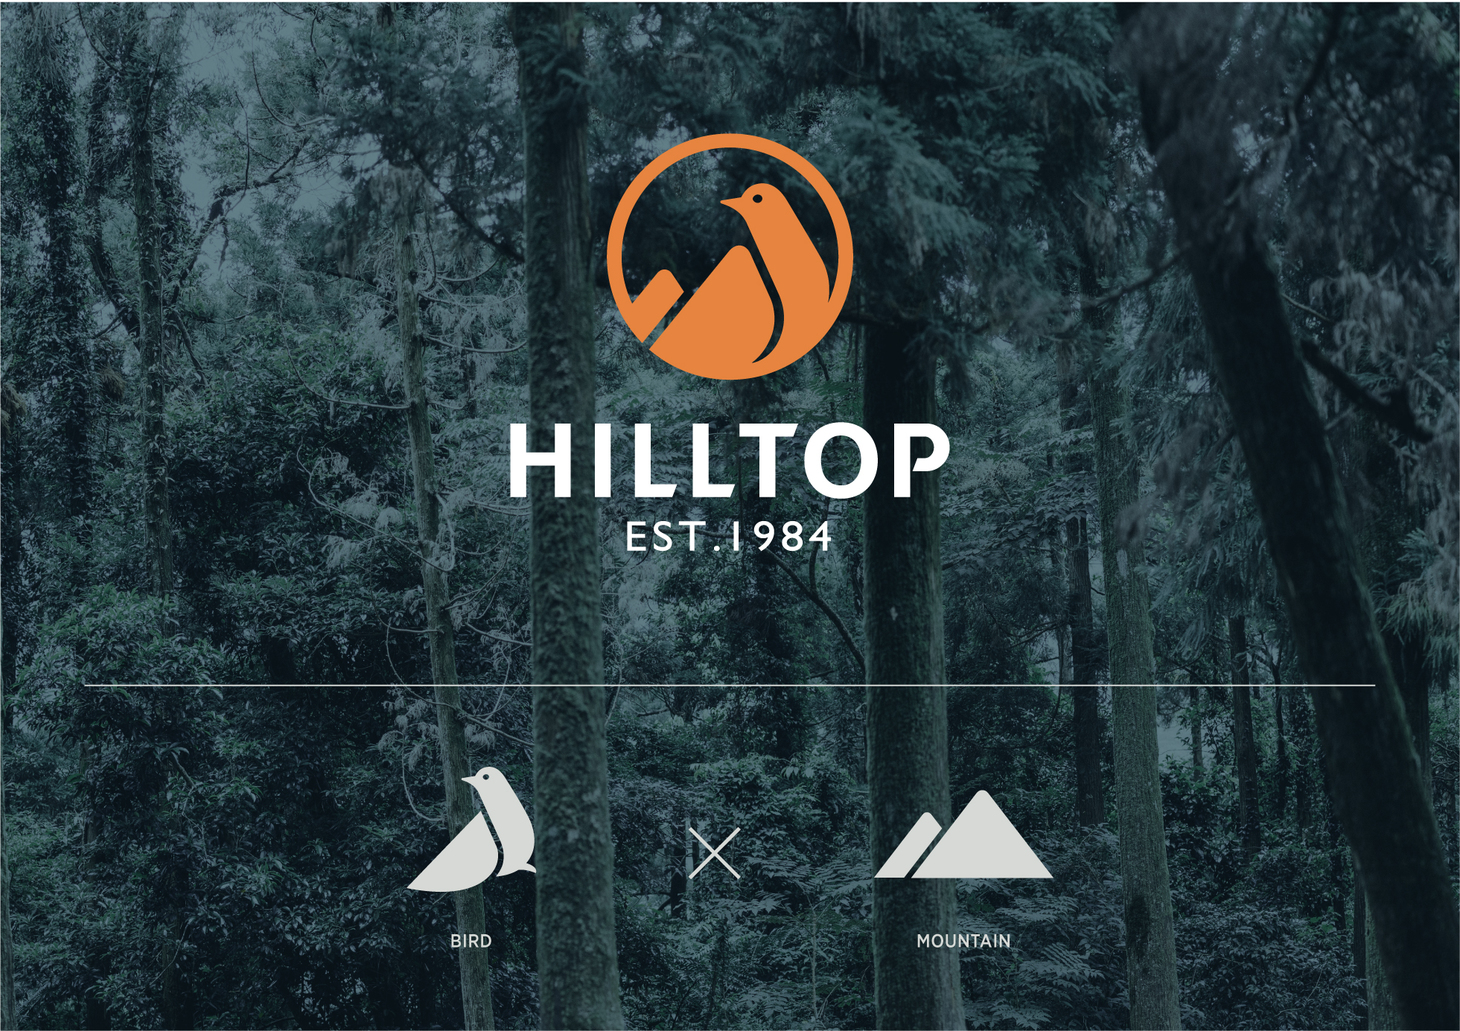 HILL_02.jpg